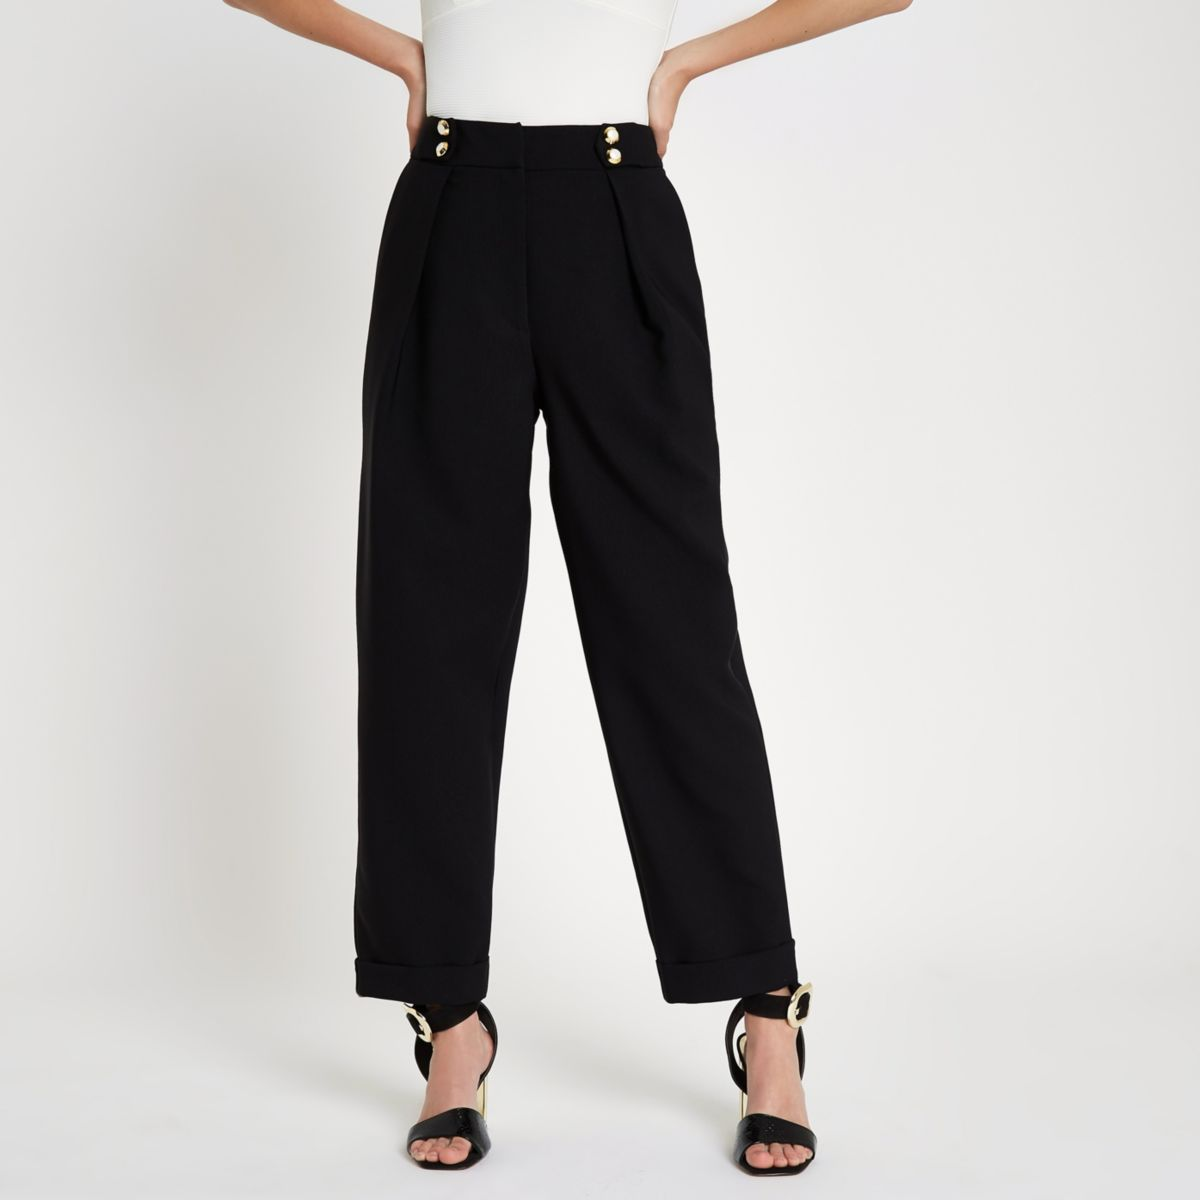 Zwarte smaltoelopende broek met knoopsluiting